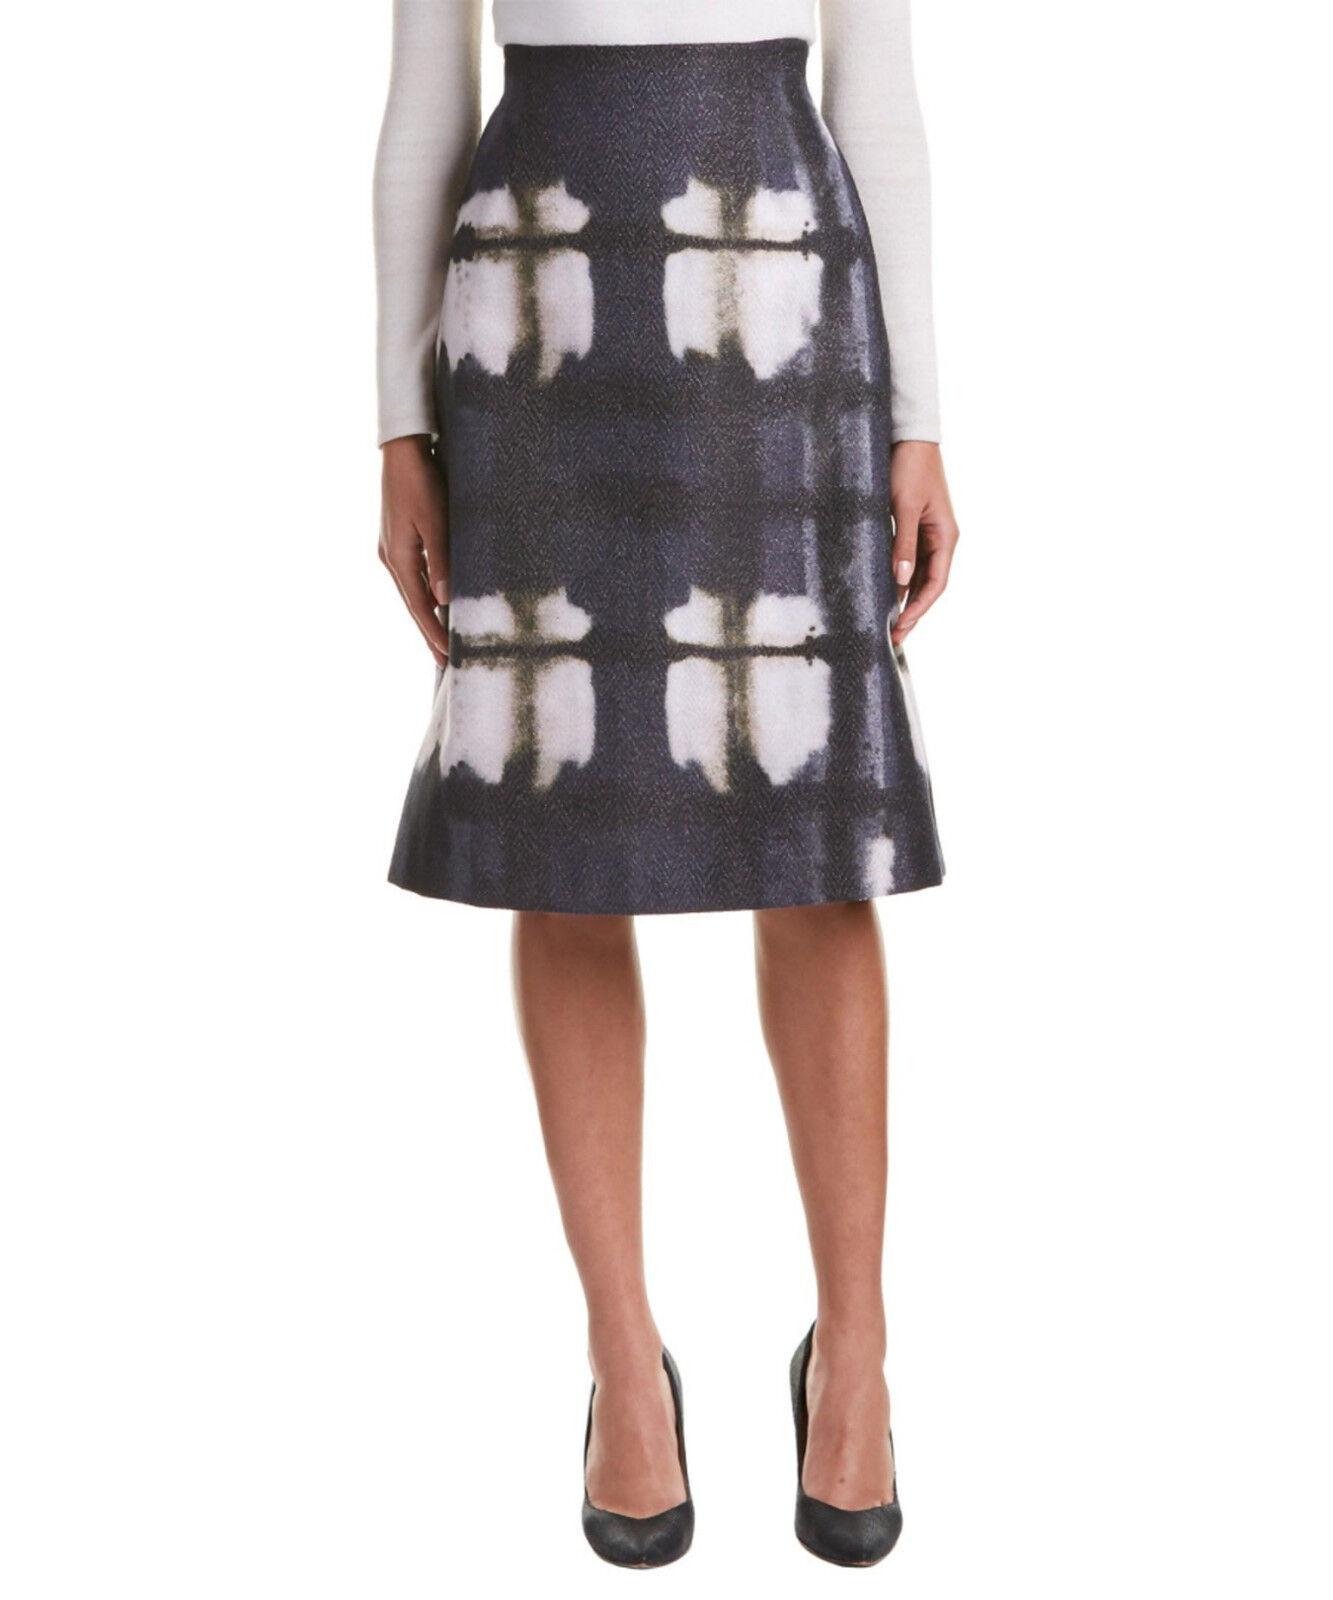 NWT Lafayette 148 New York 'Yvette' Print Metallic A-Line Skirt ,sz.8